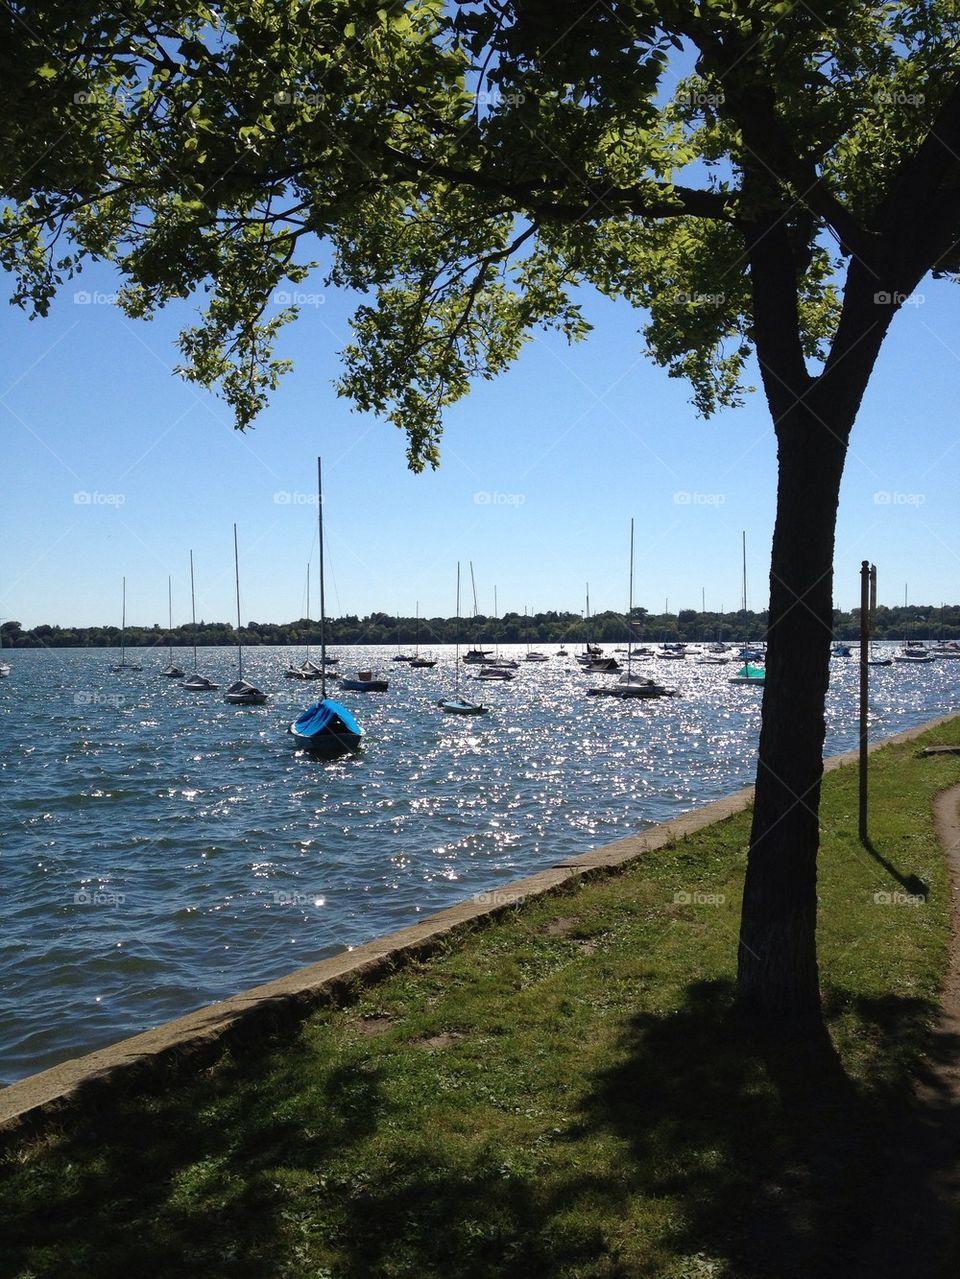 Minneapolis lake with sailboats